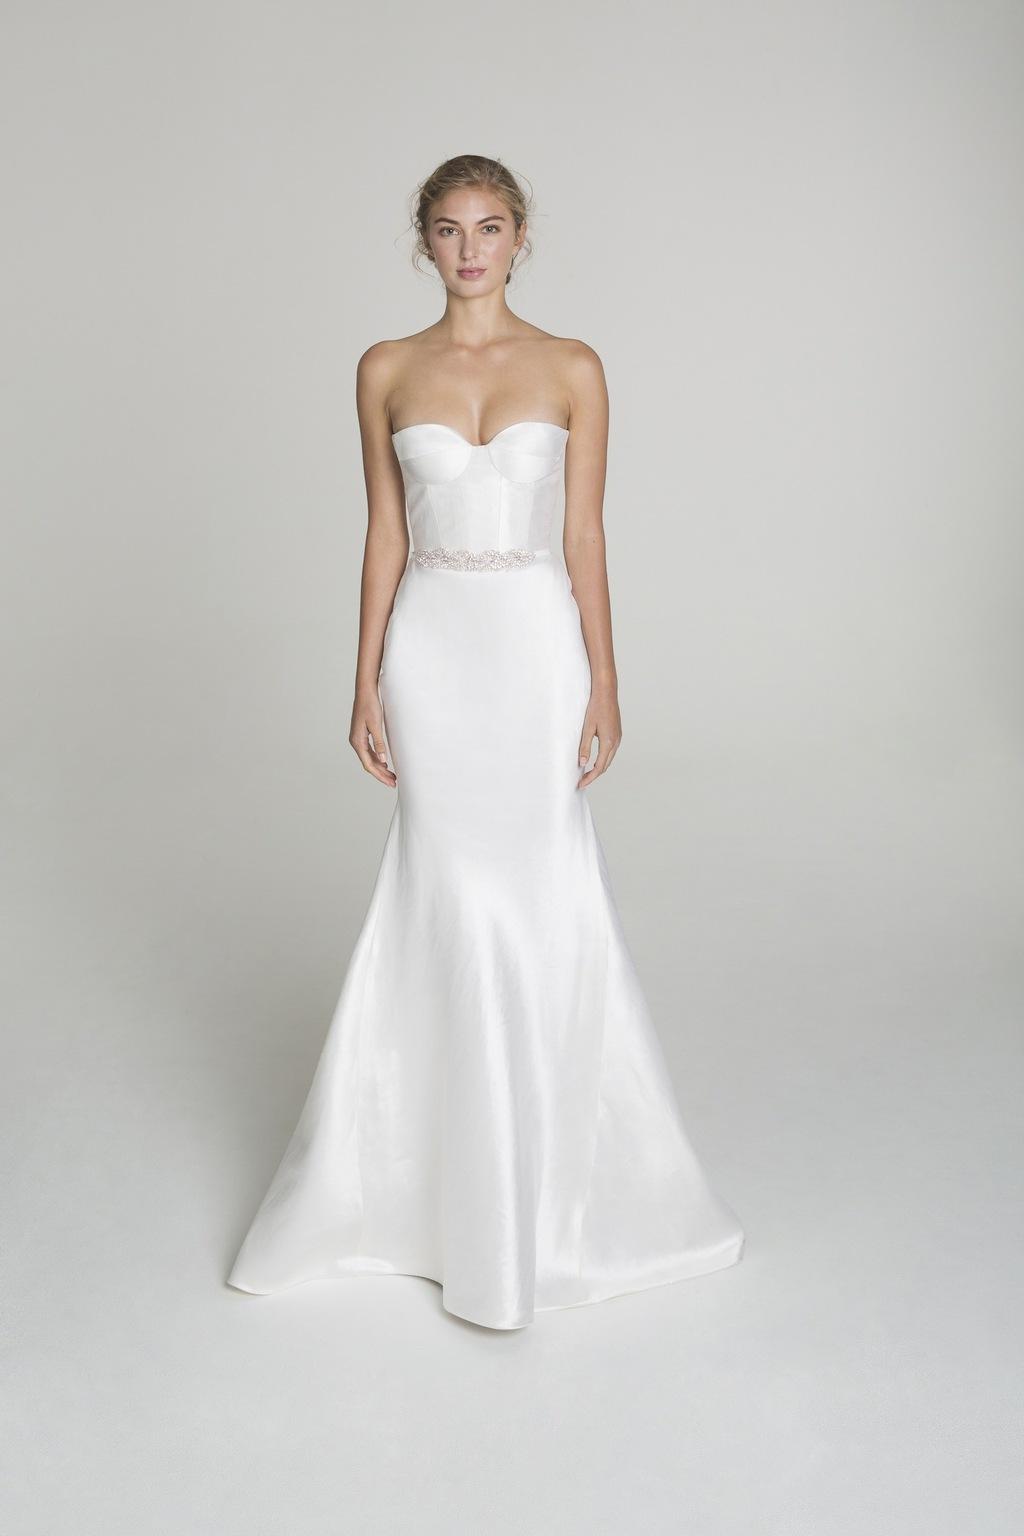 Strapless_wedding_dress_from_alana_aoun.full